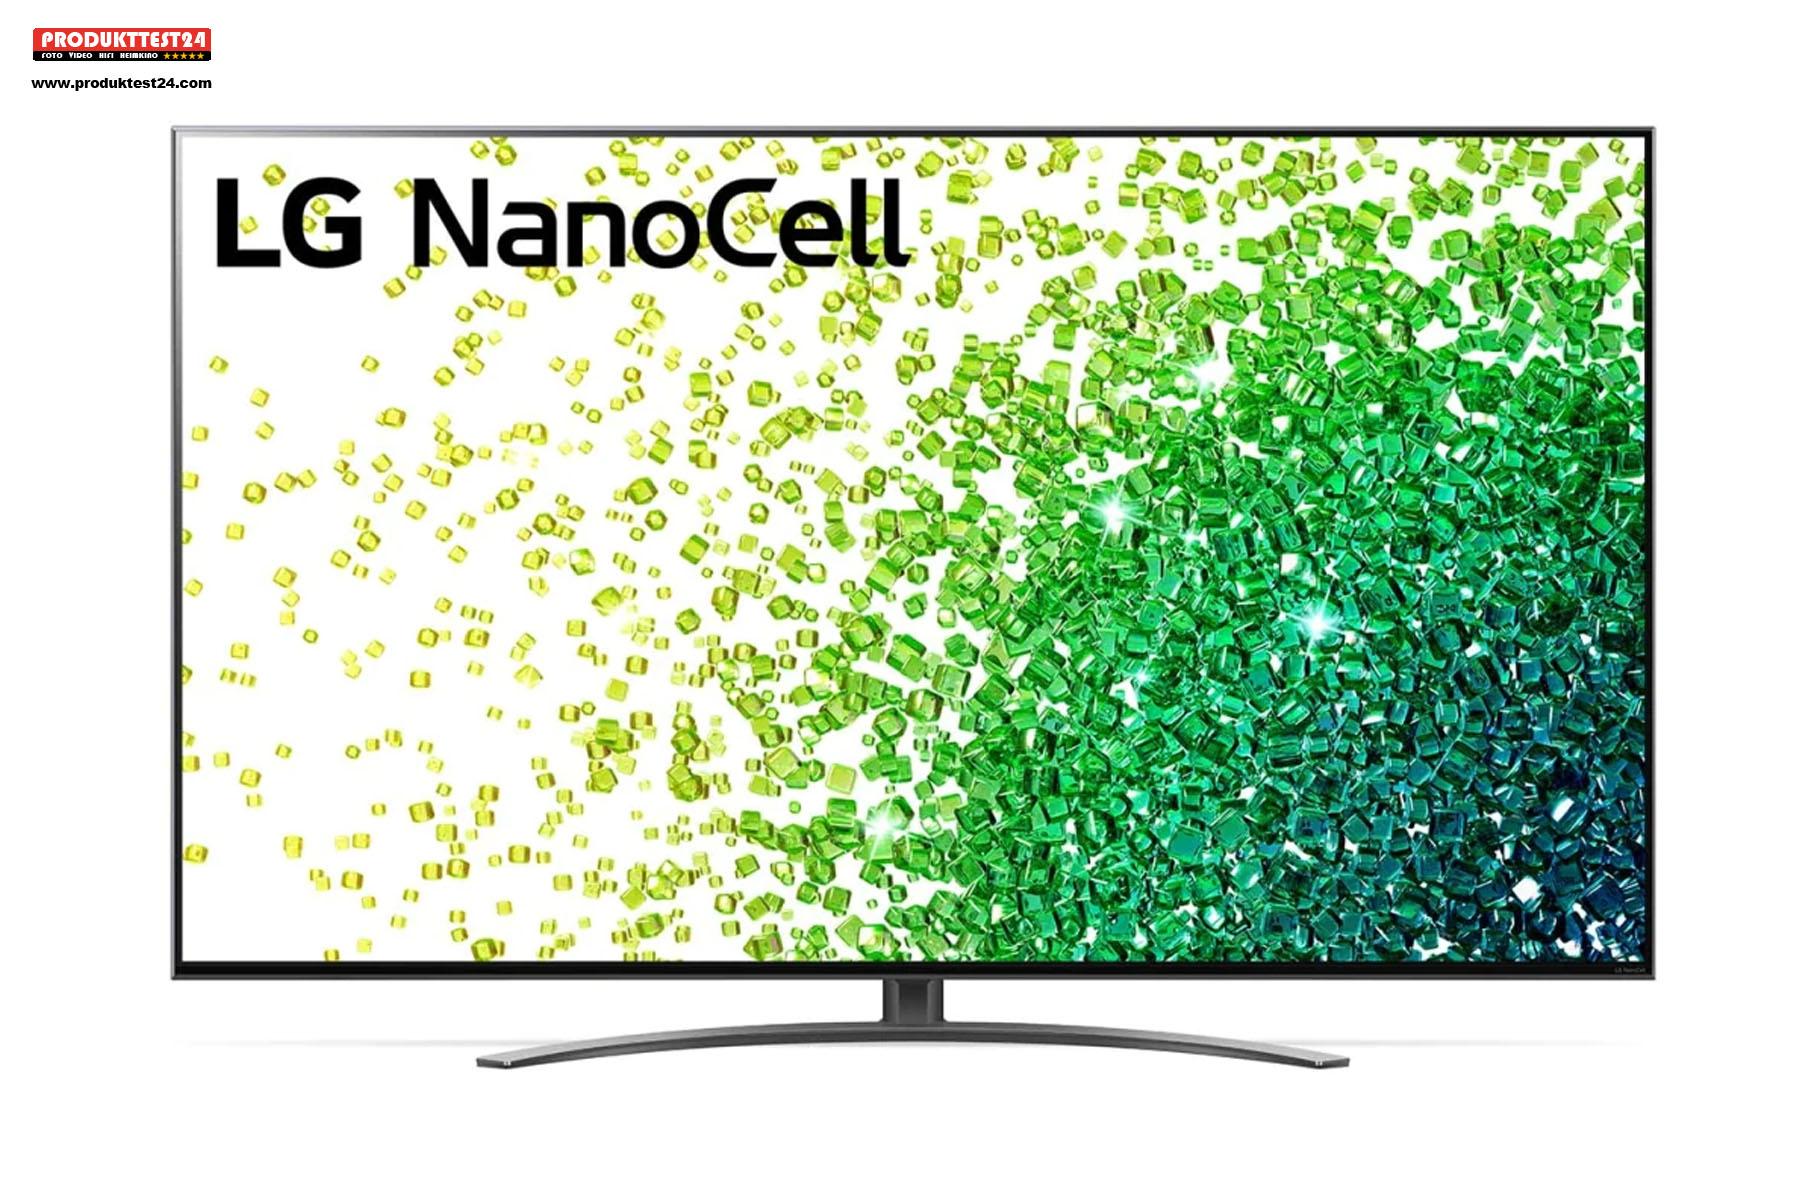 Der 65 Zoll große LG 65NANO869PA Nano Cell 4K-Fernseher